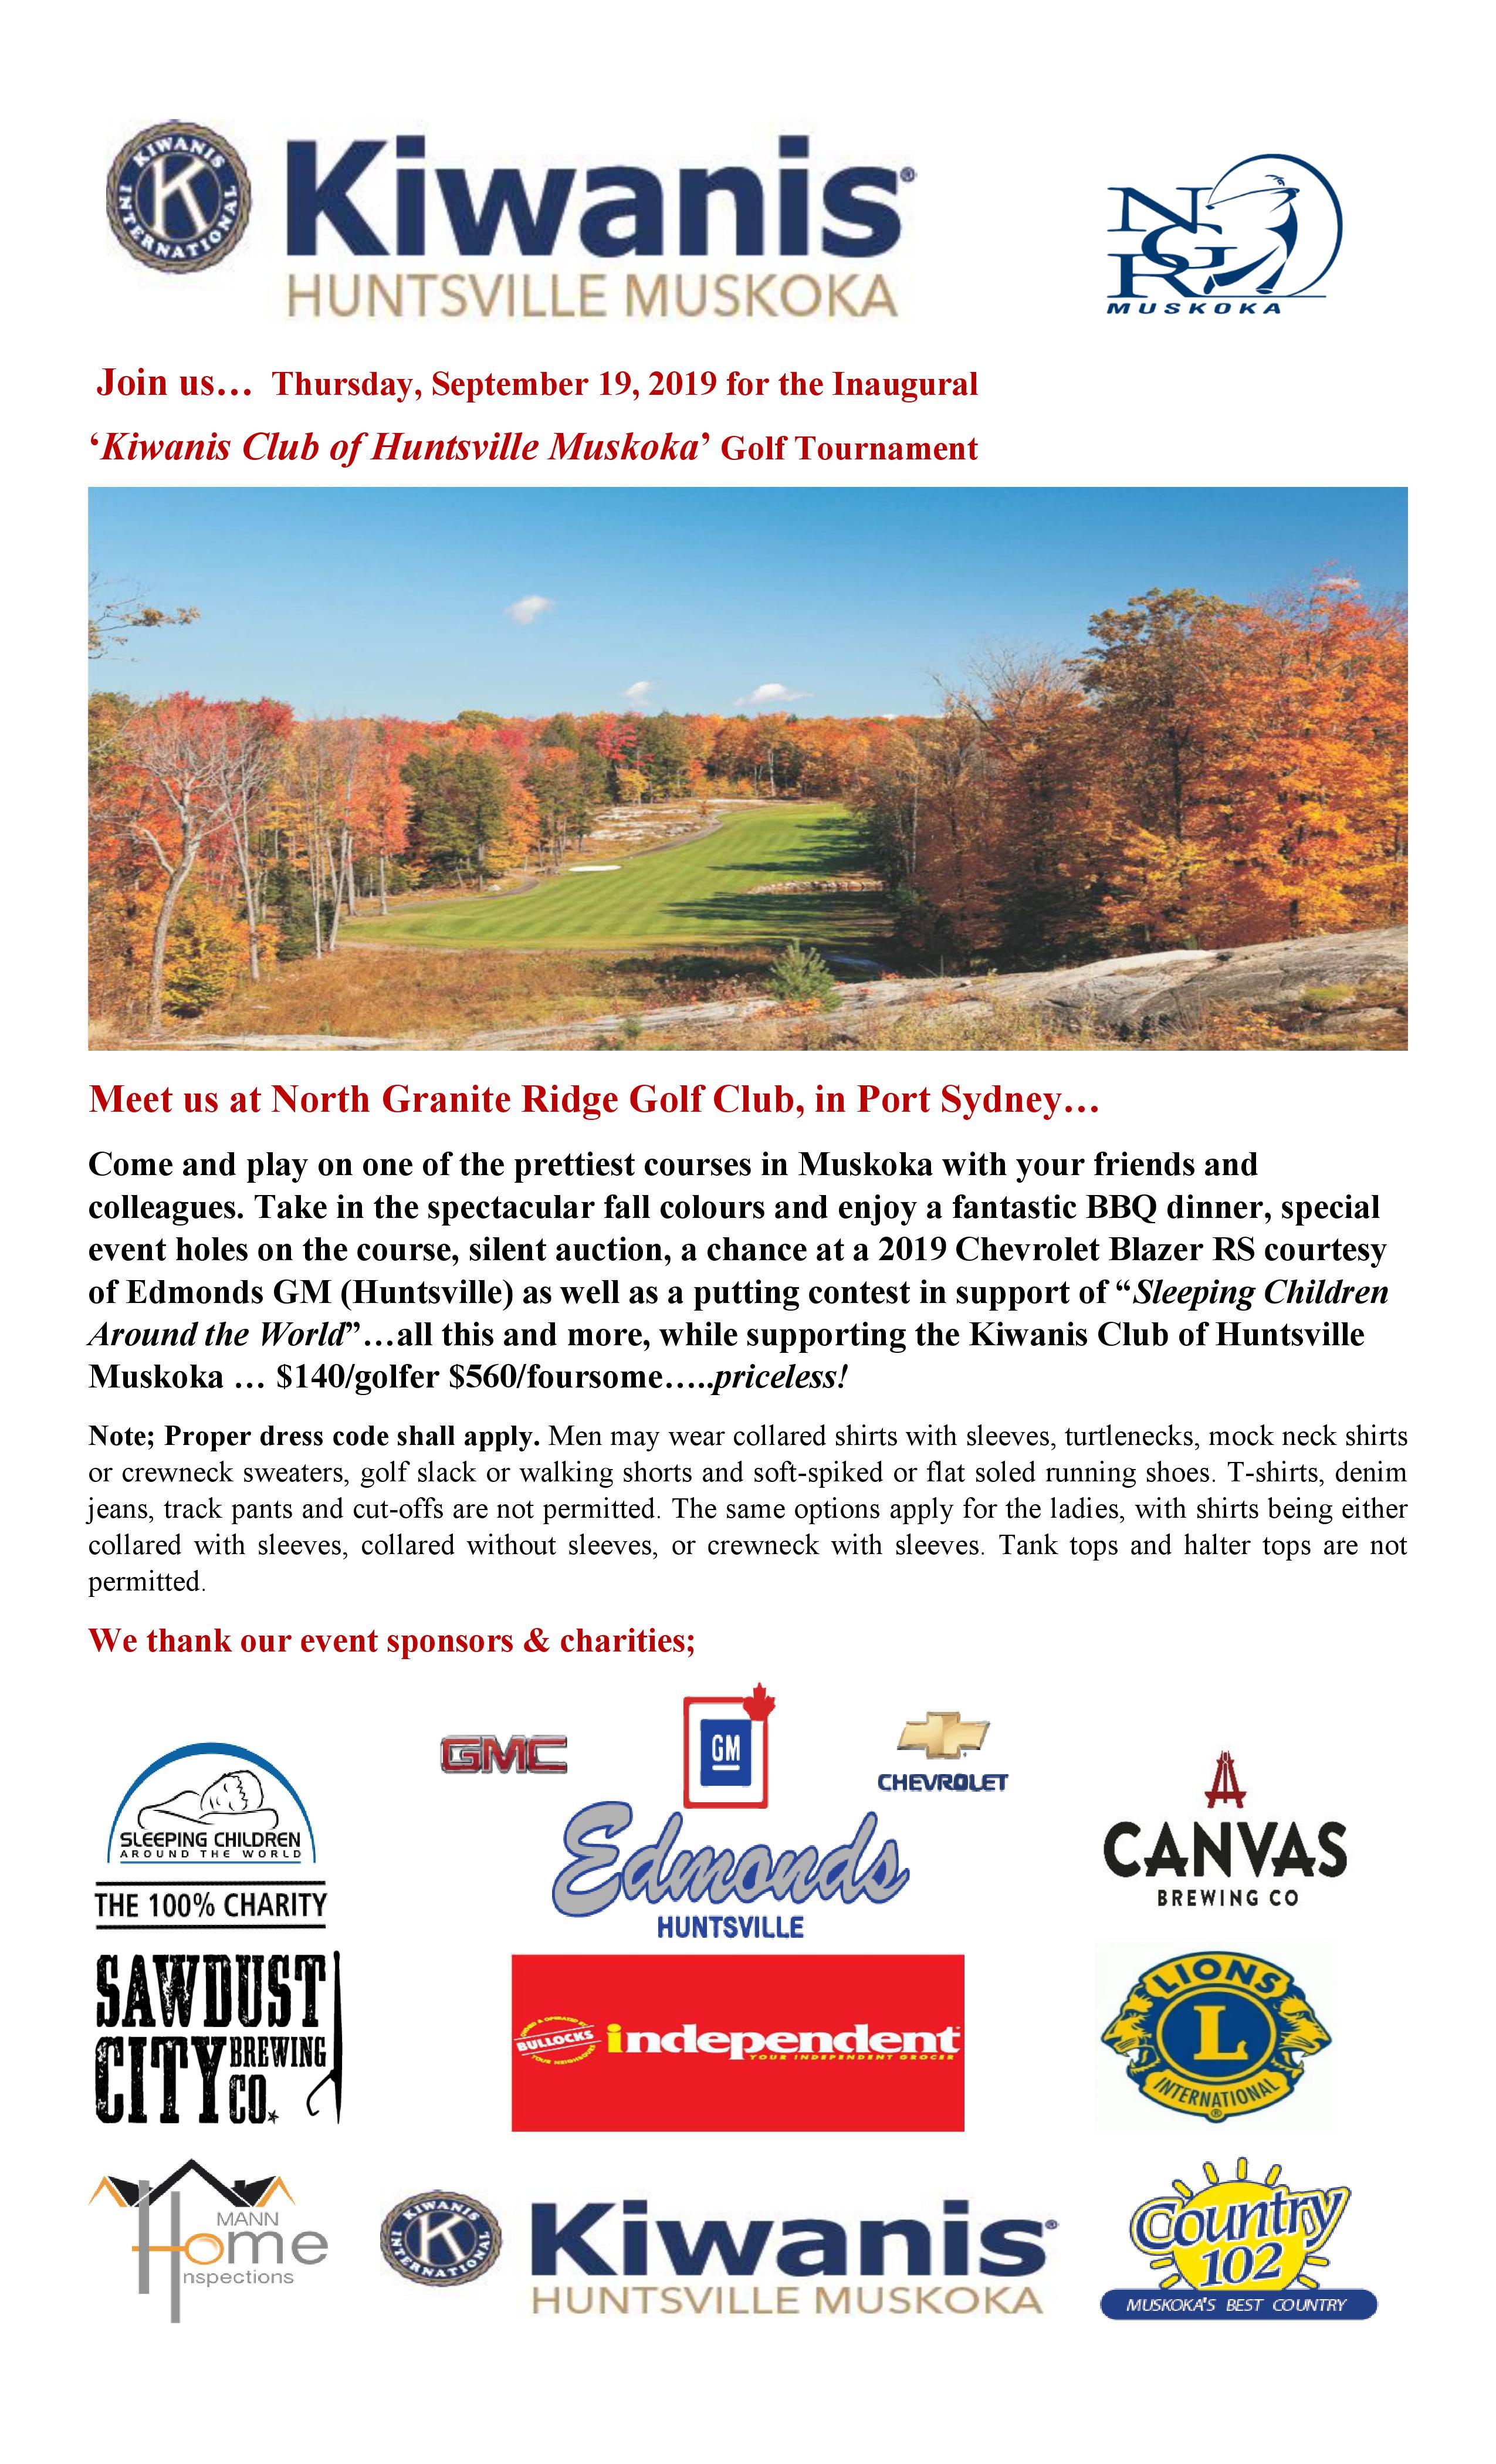 Kiwanis Club of Huntsville Muskoka Golf Tournament Poster